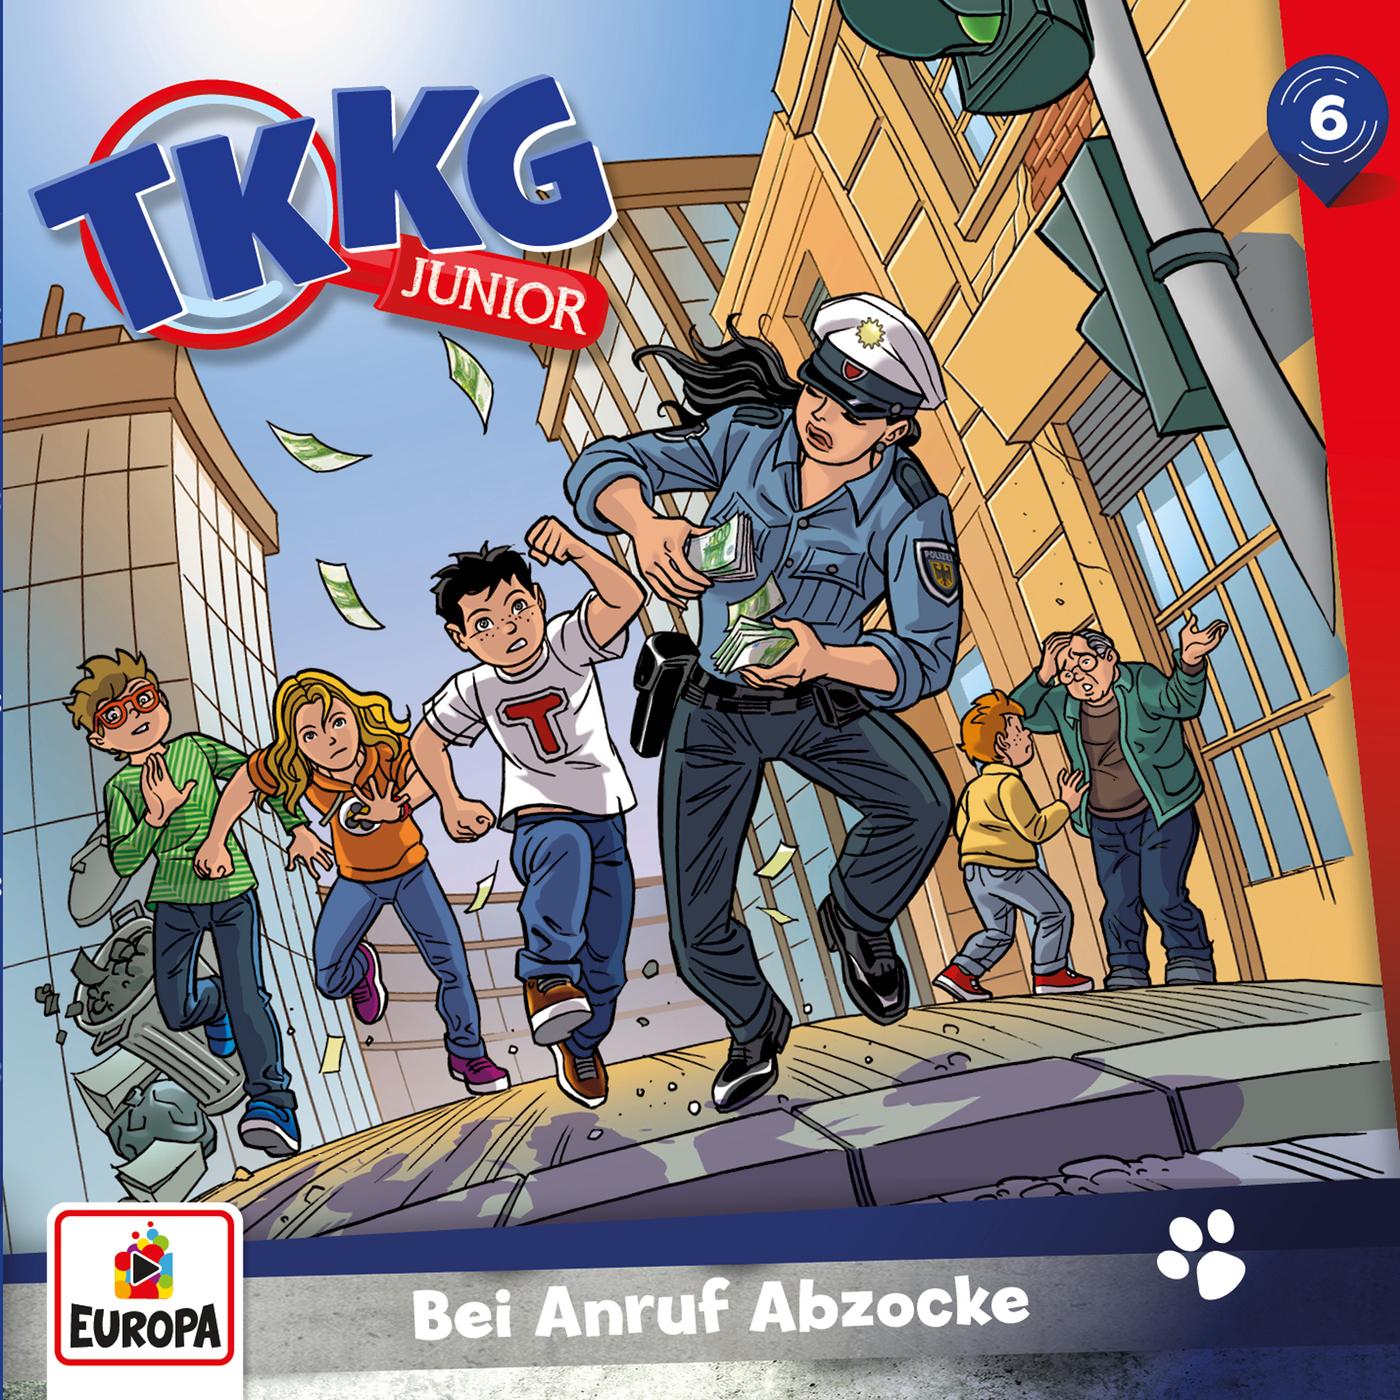 006/Bei Anruf Abzocke - TKKG Junior